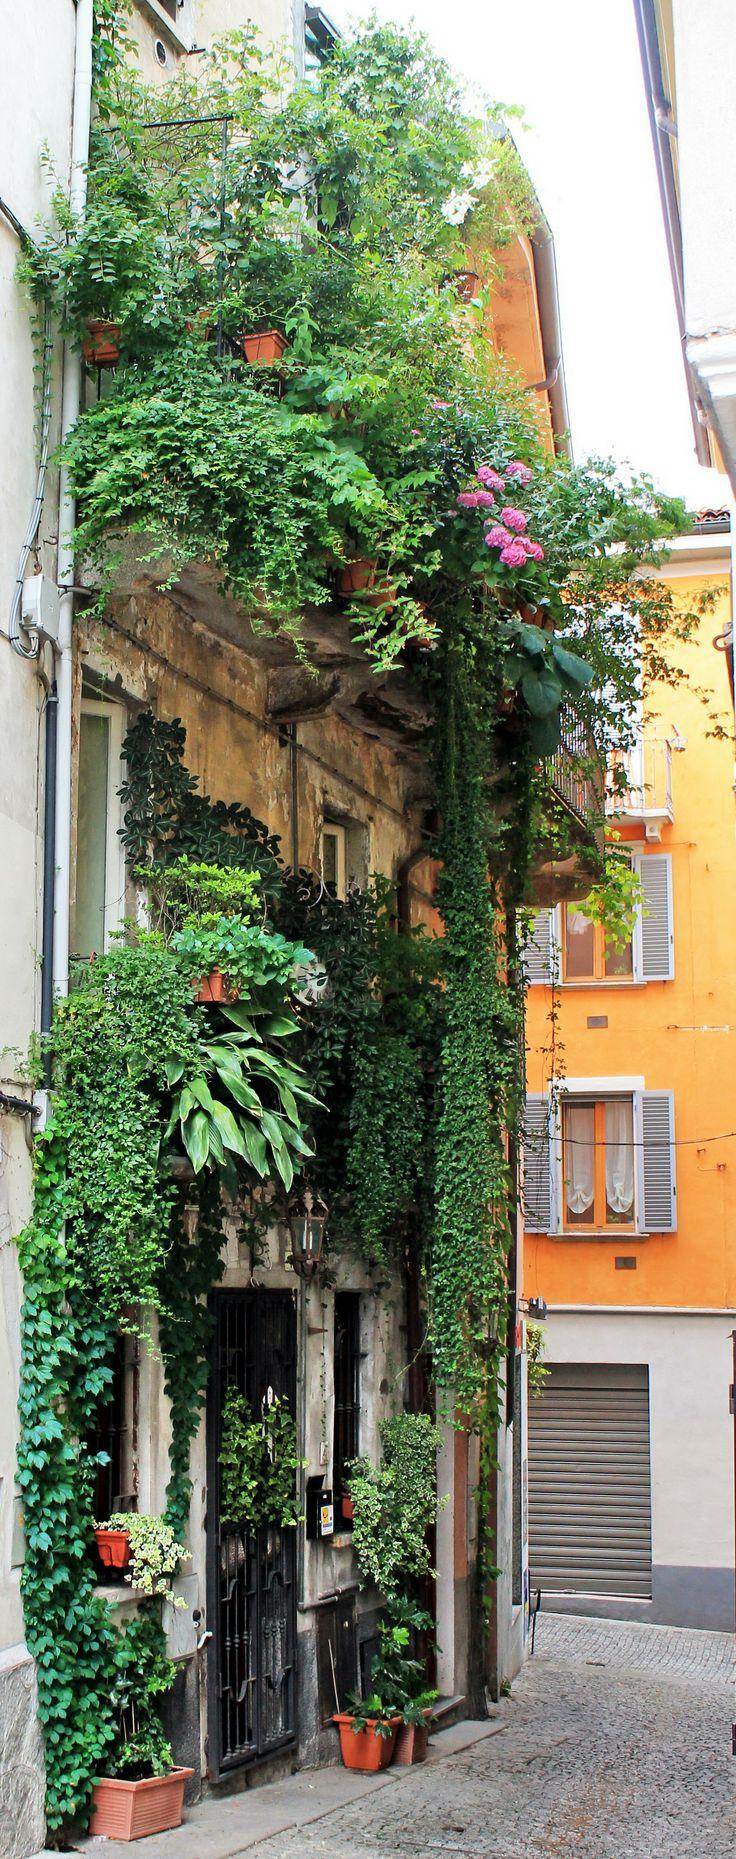 Verbiana (Piemonte) - Italy - by Guido Tosatto